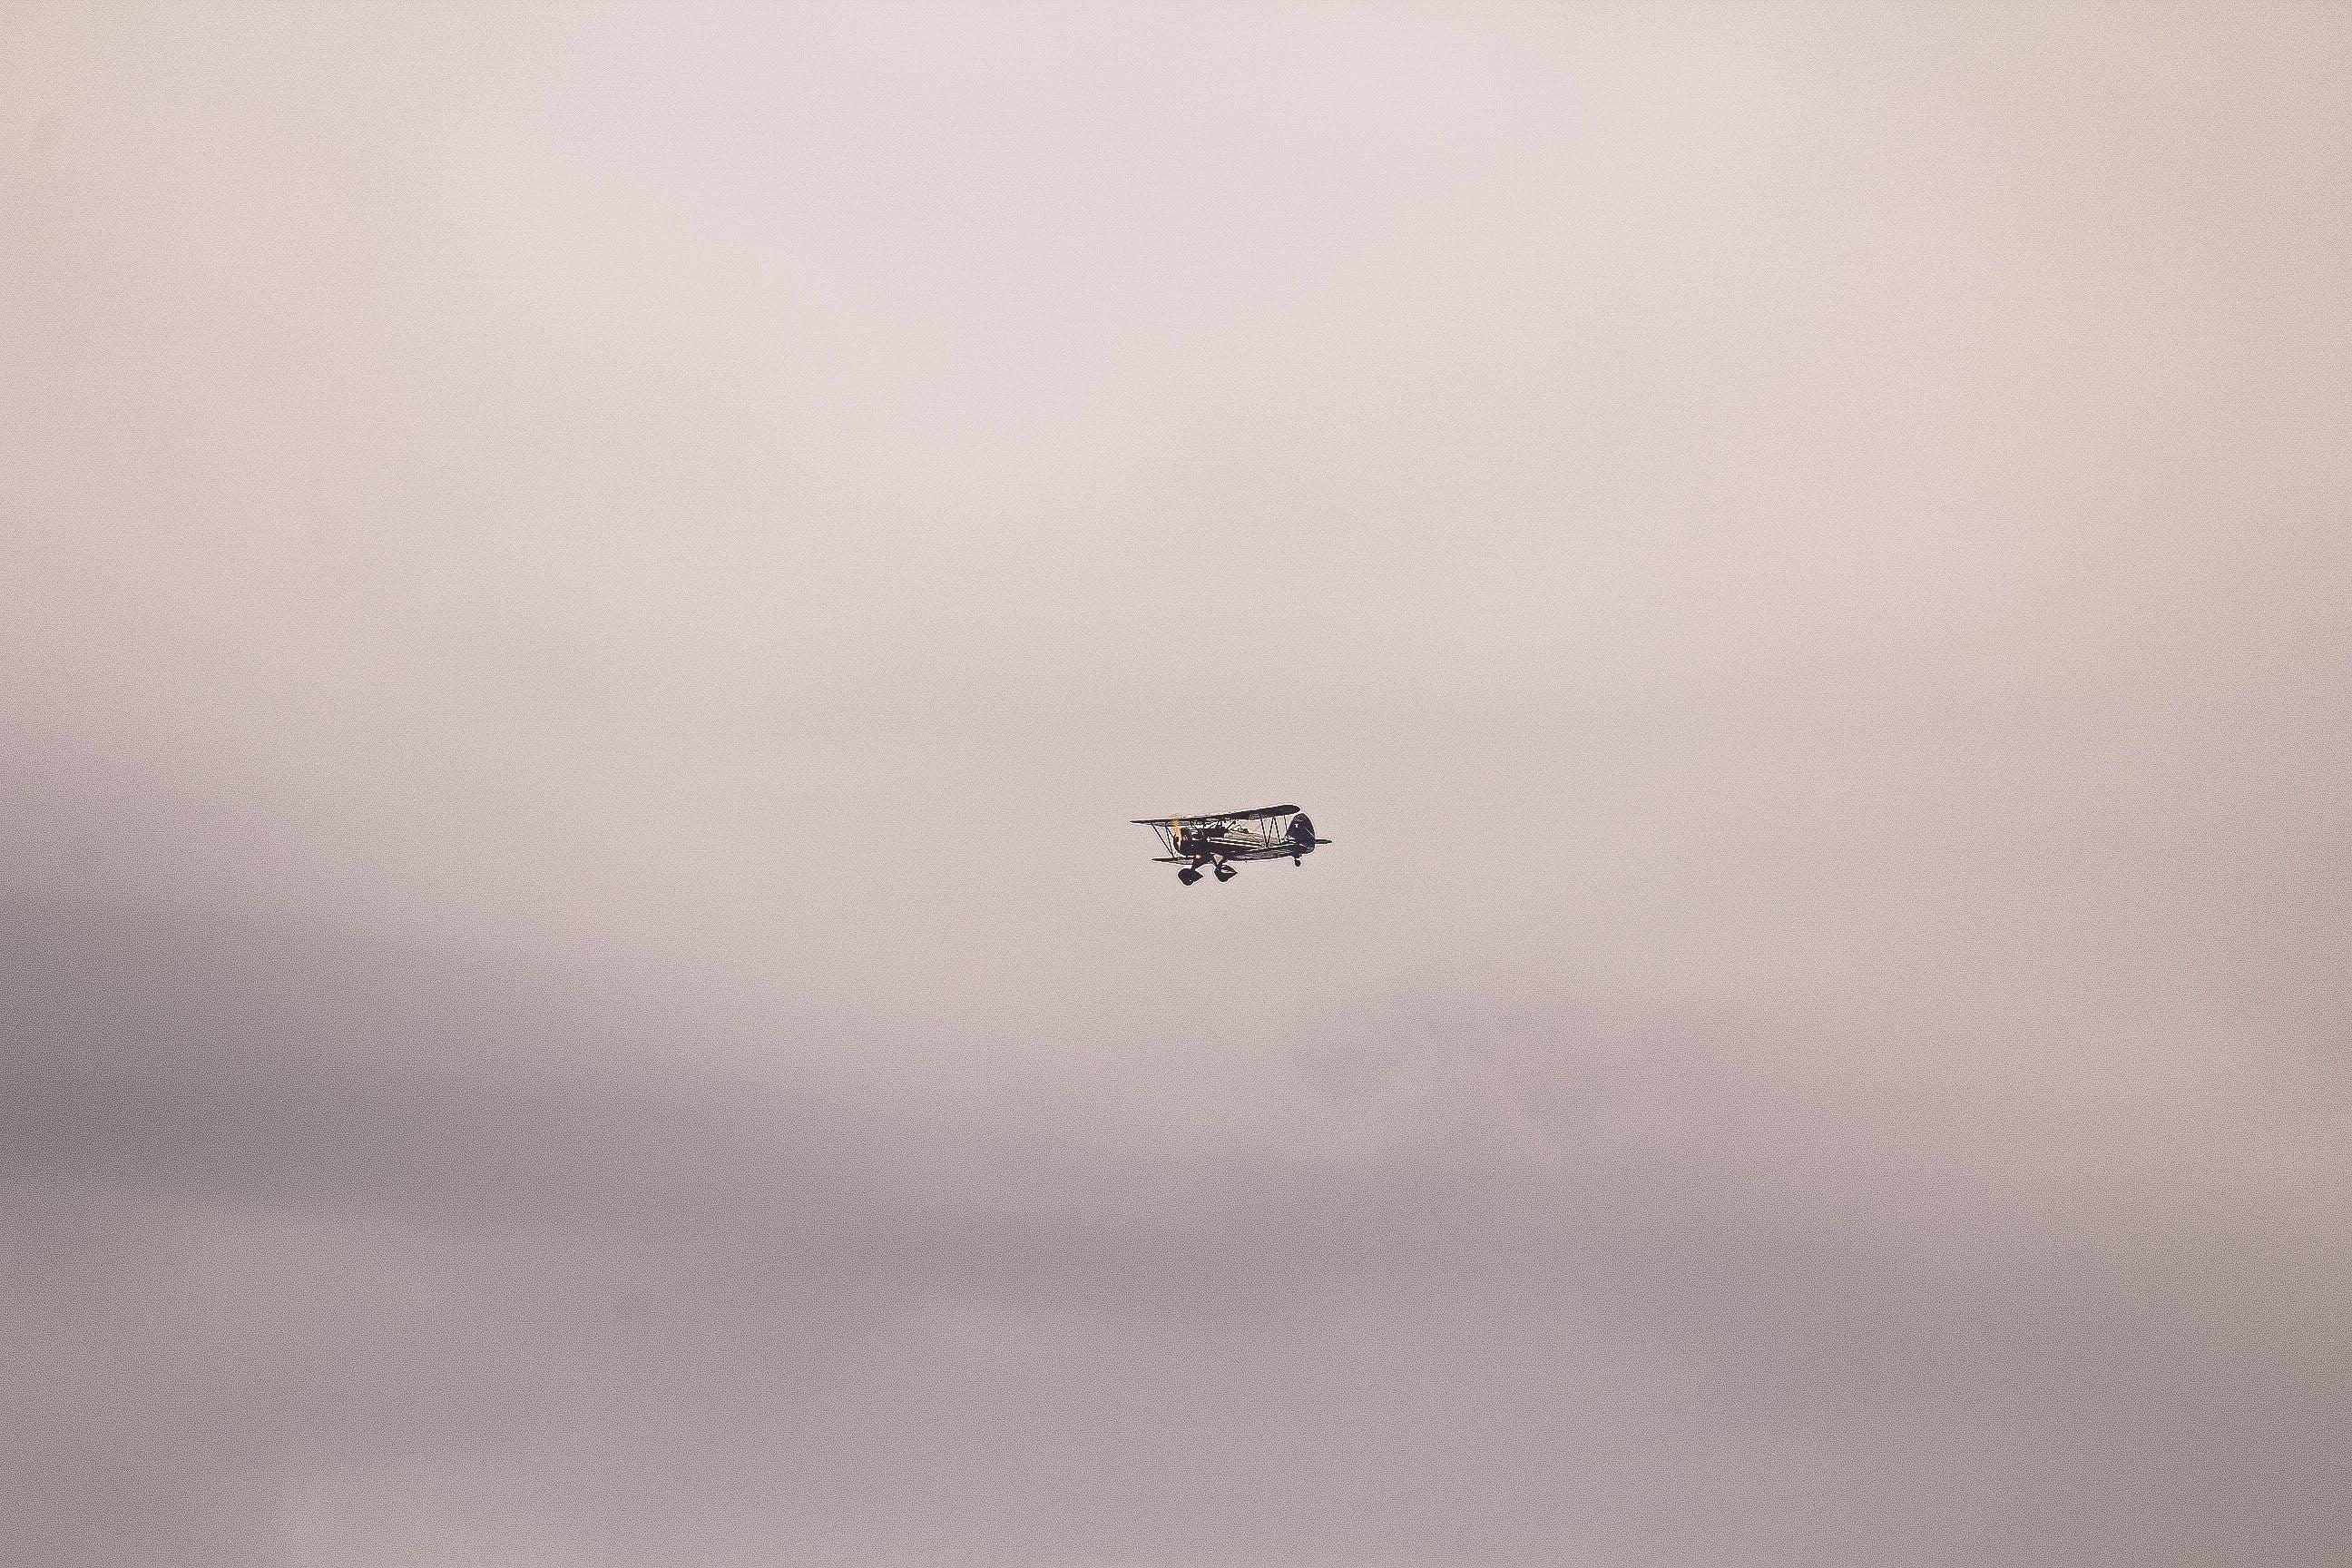 Gray and Black Biplane